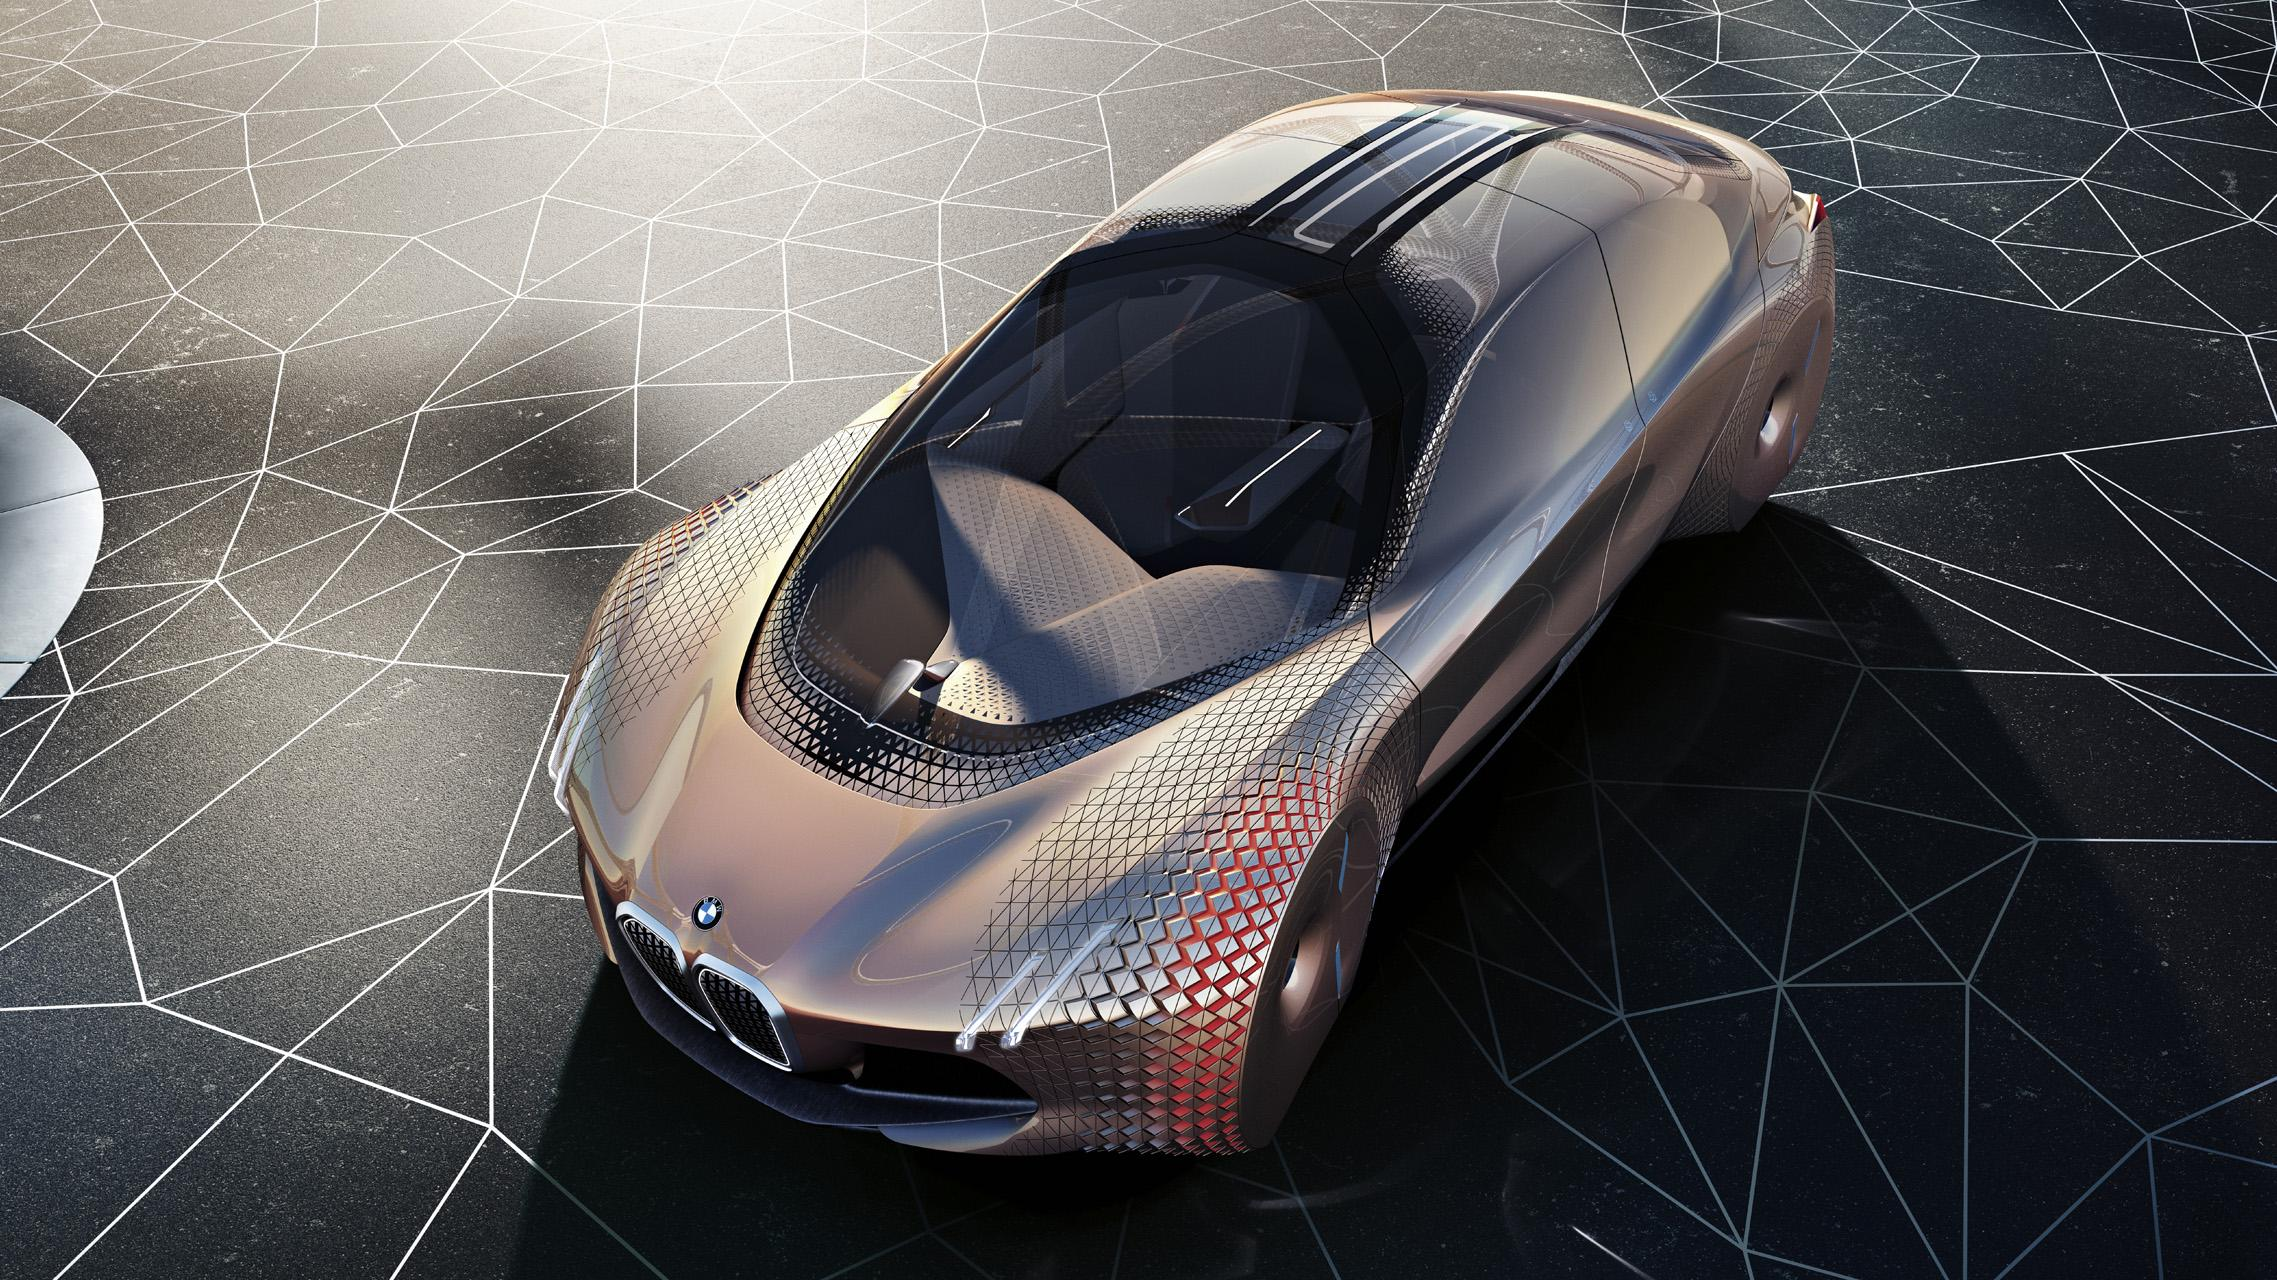 The Bmw Vision Next 100 Concept Car Videos Bimmerfile